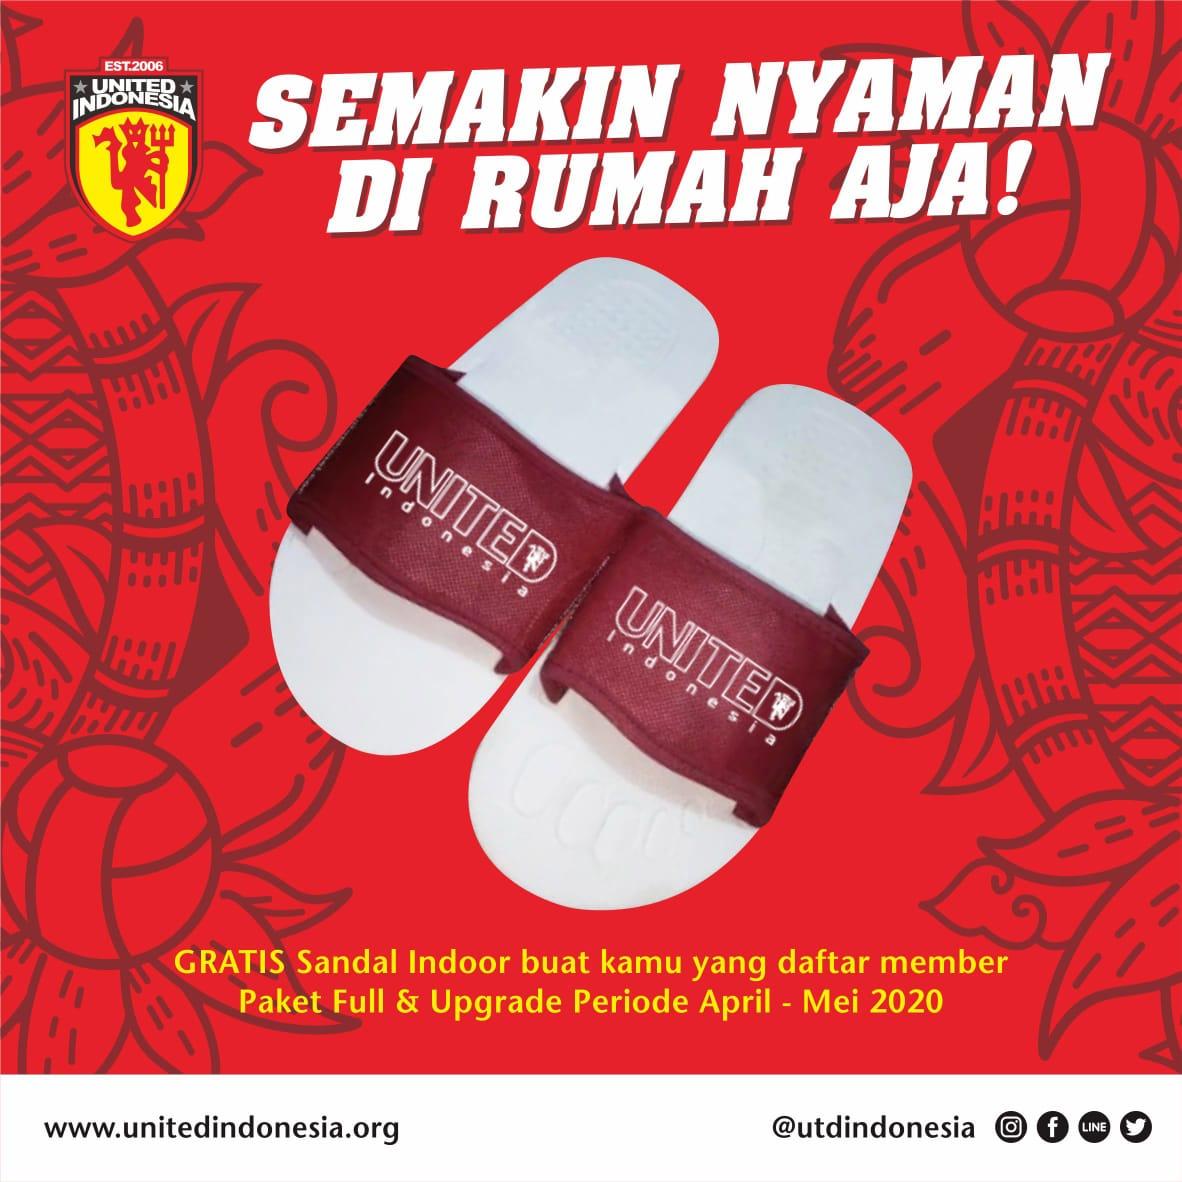 Dalam rangka ikut mensukseskan program #dirumahaja, kami memberikan bonus berupa sandal indoor buat kamu yang daftar Membership United Indonesia paket Full & Upgrade pada periode April-Mei 2020 https://t.co/ZXt6pPyZ6O